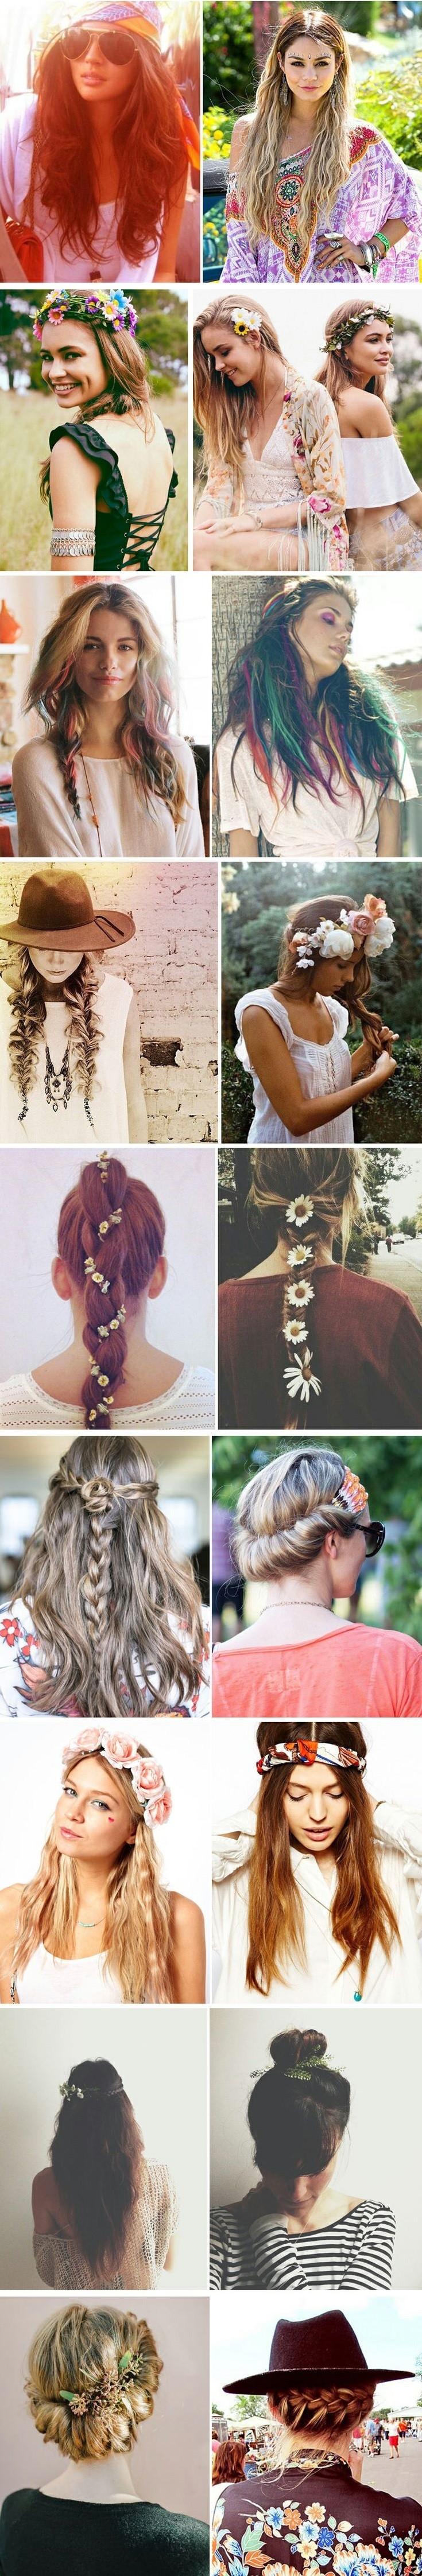 Boho hairstyles for teenage girls